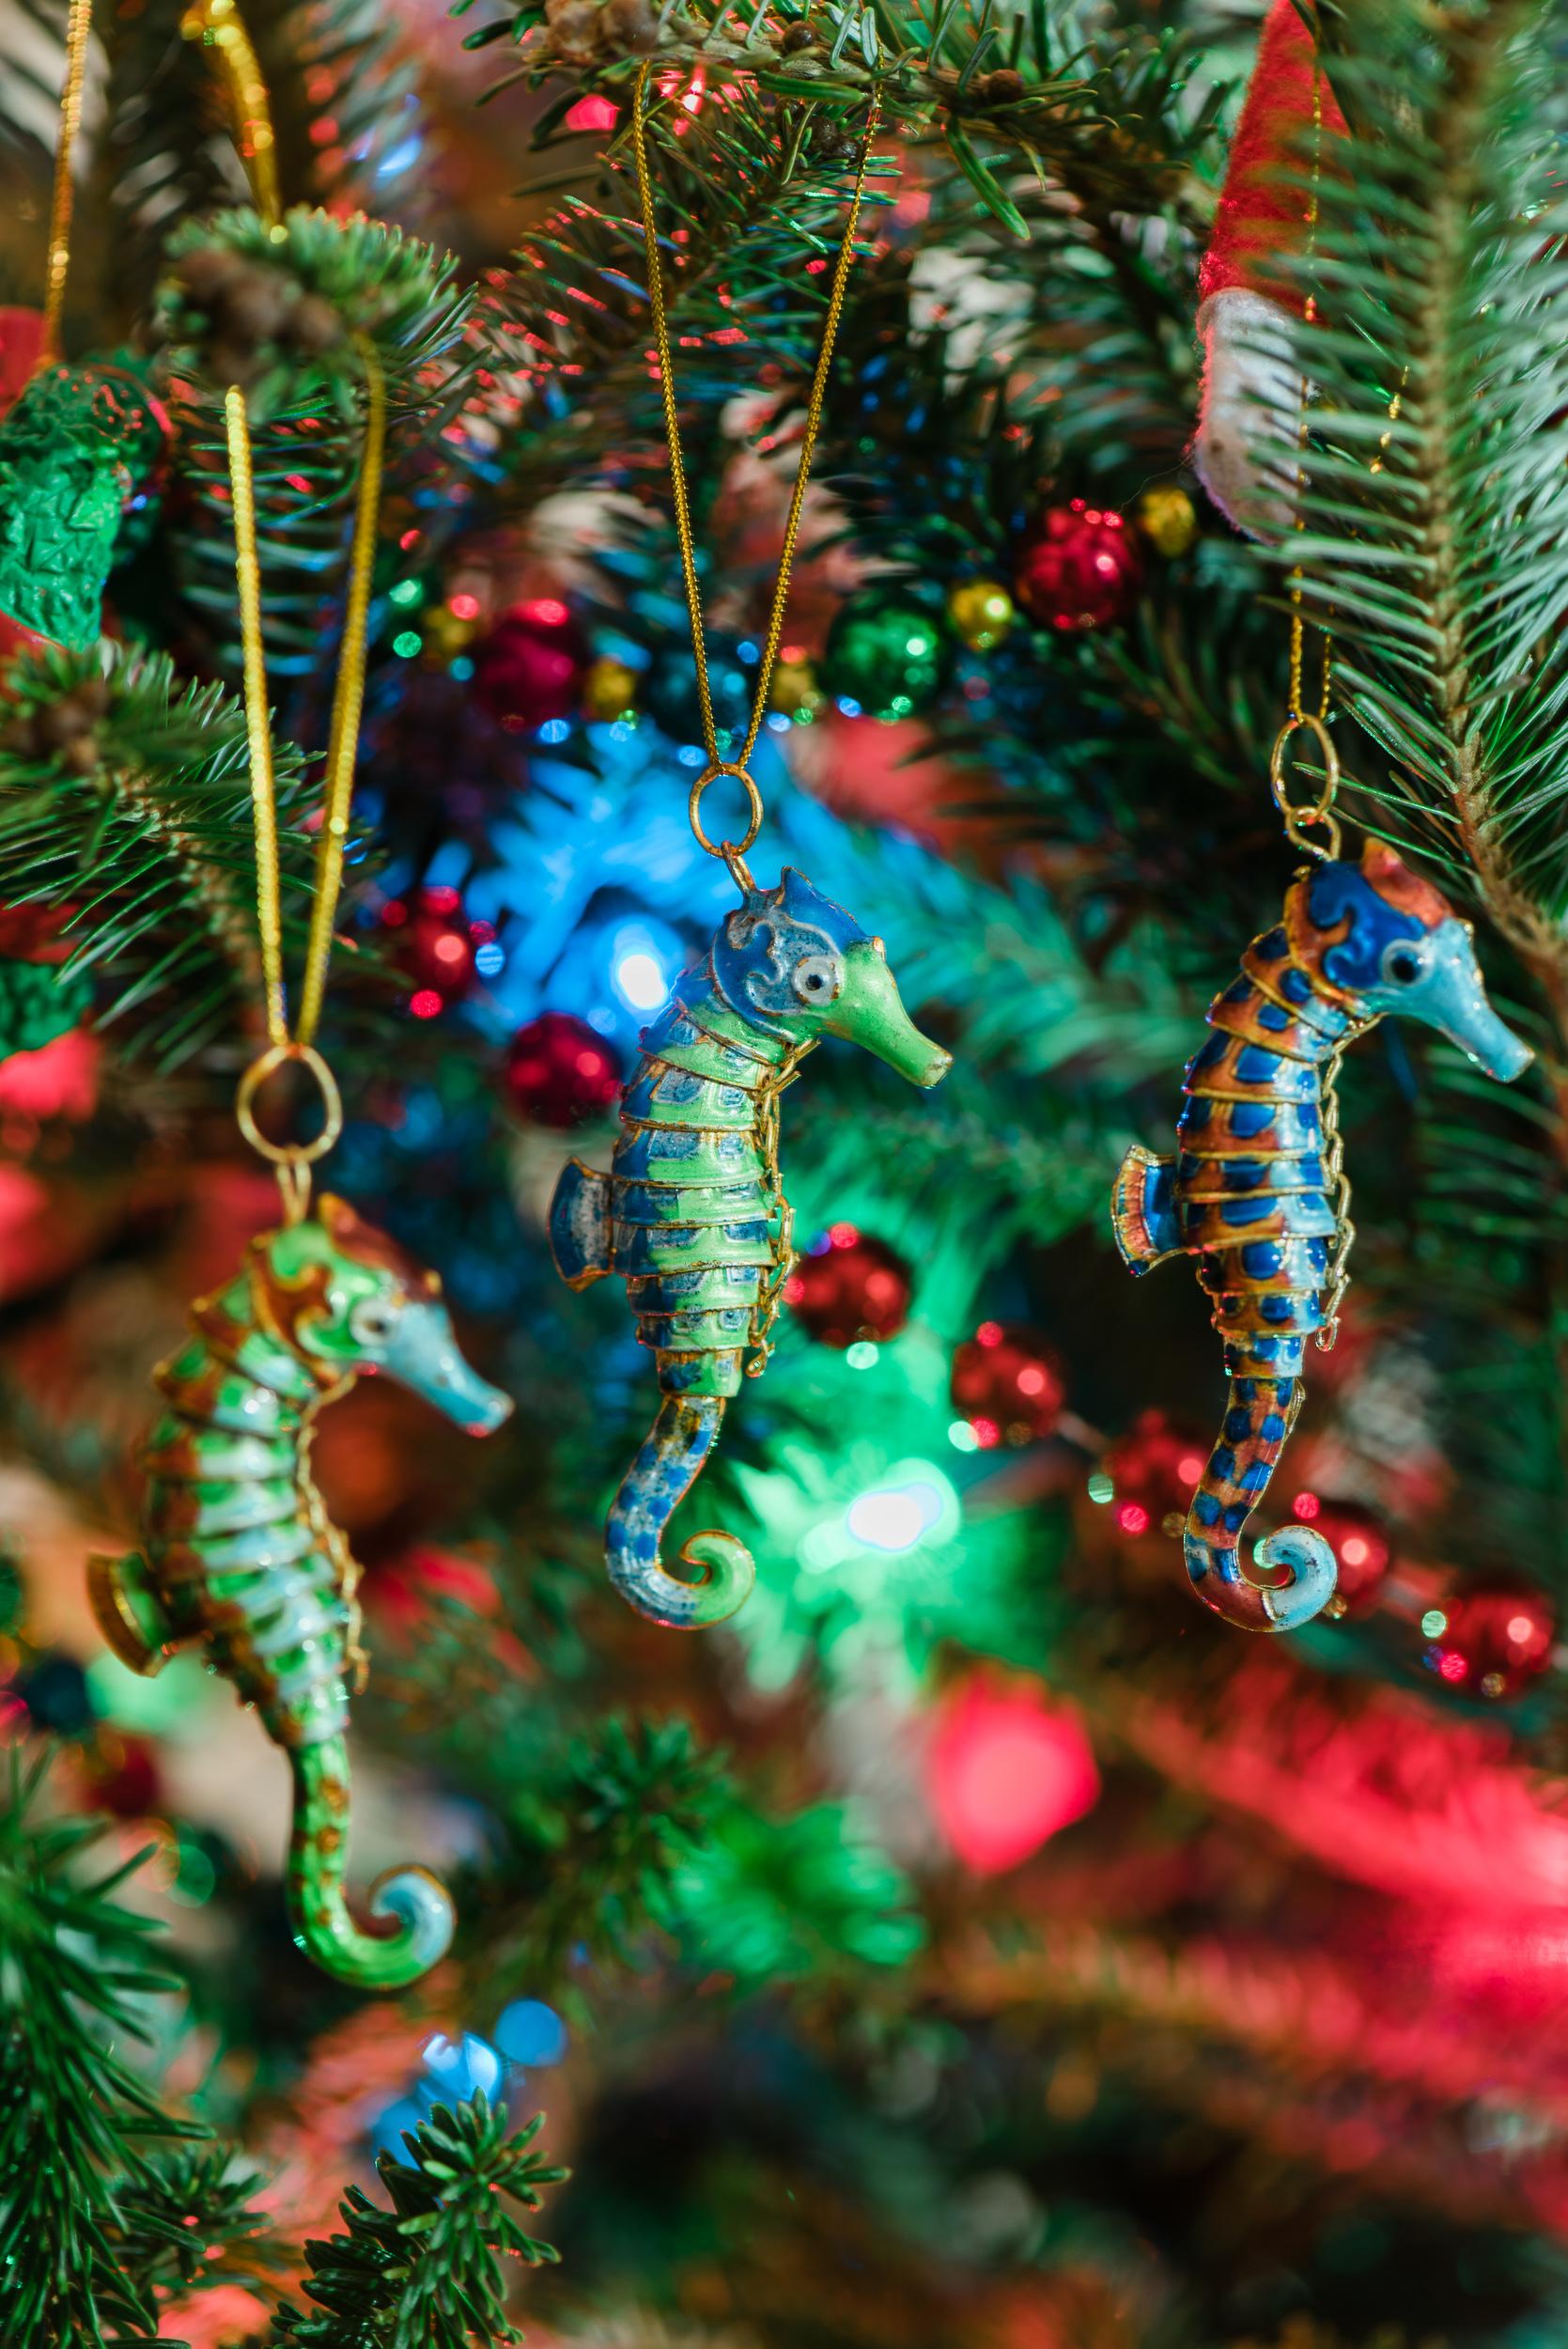 Seahorse-Christmas-Tree-Ornaments-Sarah-Danielle-Portraits-Florida-Photographer